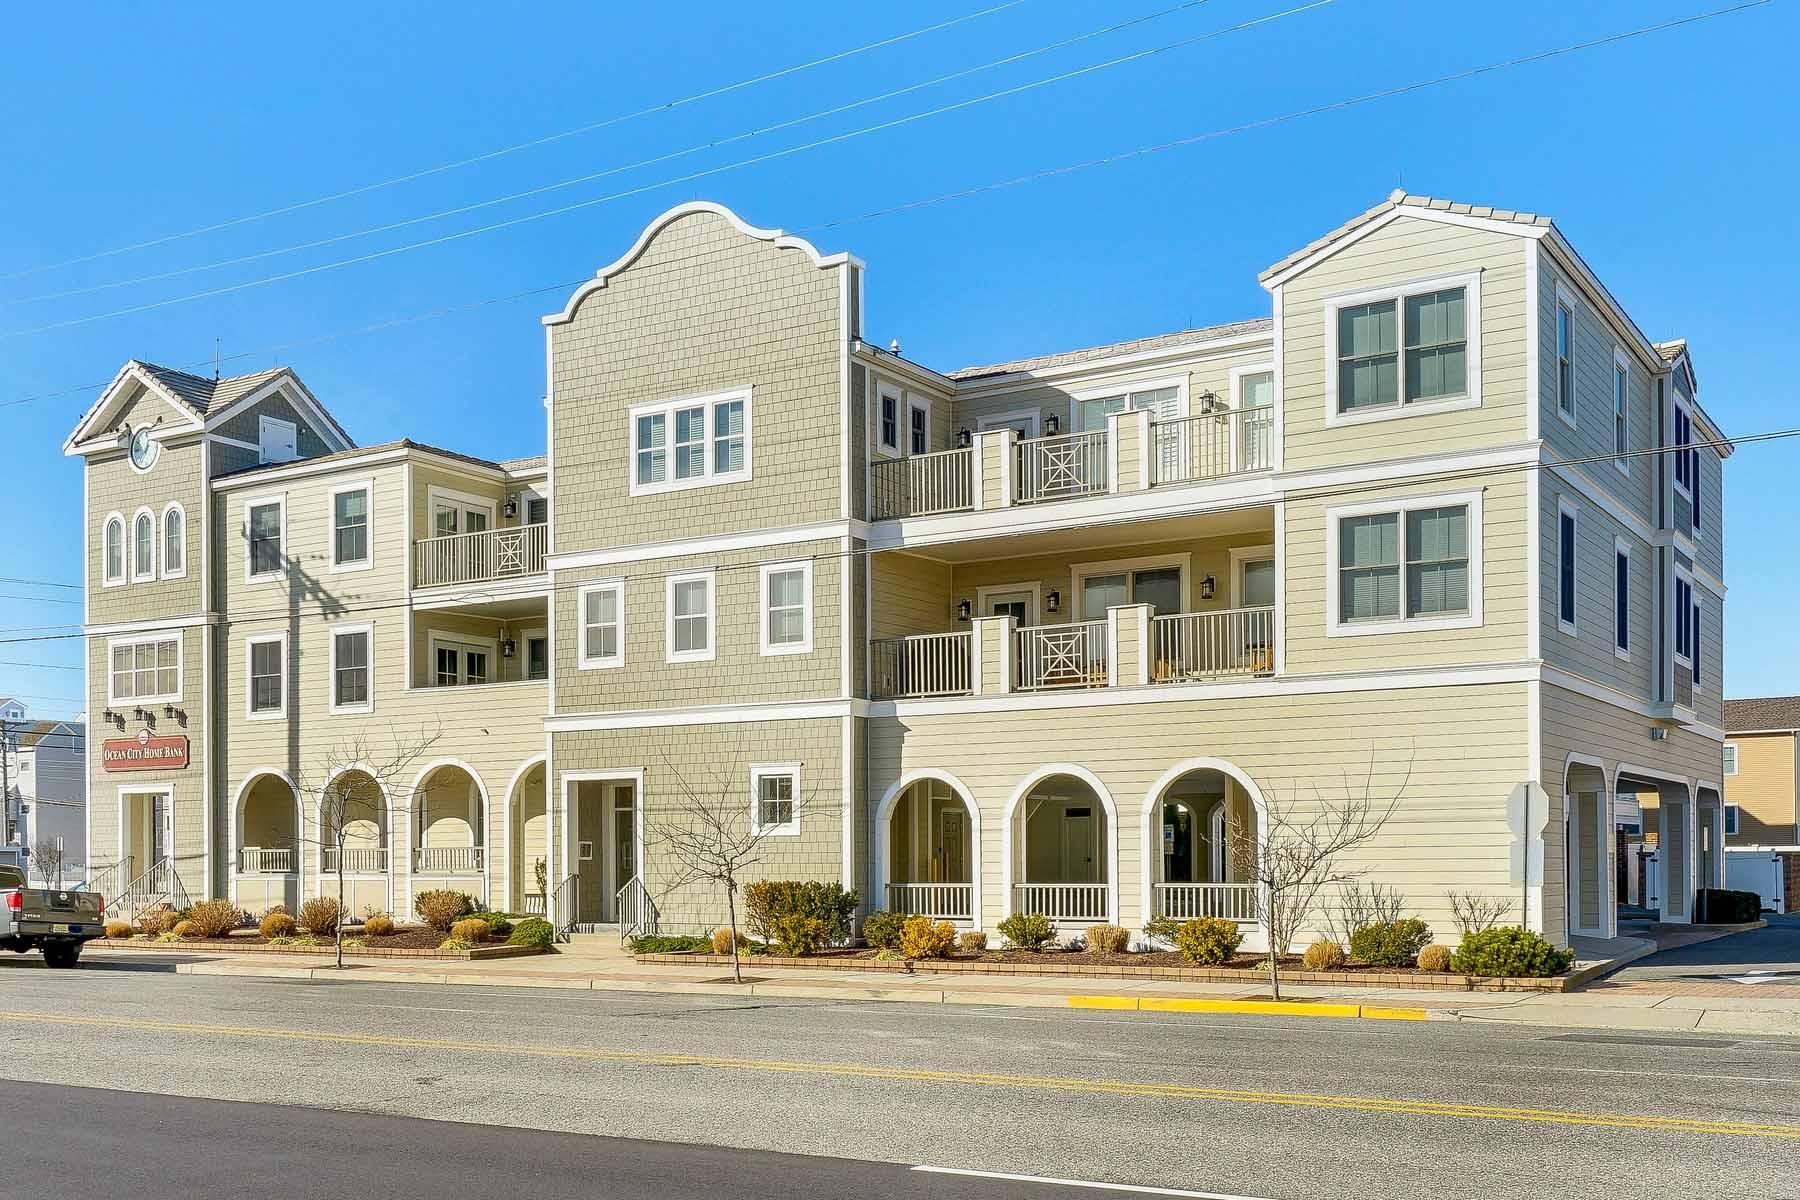 Condominium for Sale at 9219 Atlantic Unit 1 Margate, New Jersey 08402 United States